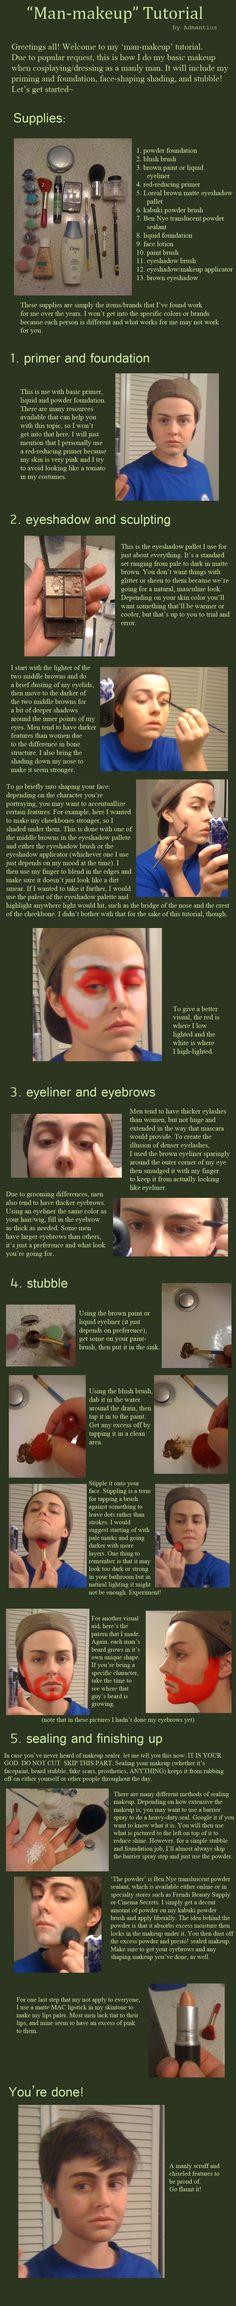 'Man-Makeup' and Stubble Tutorial by Admantius.deviantart.com on @deviantART